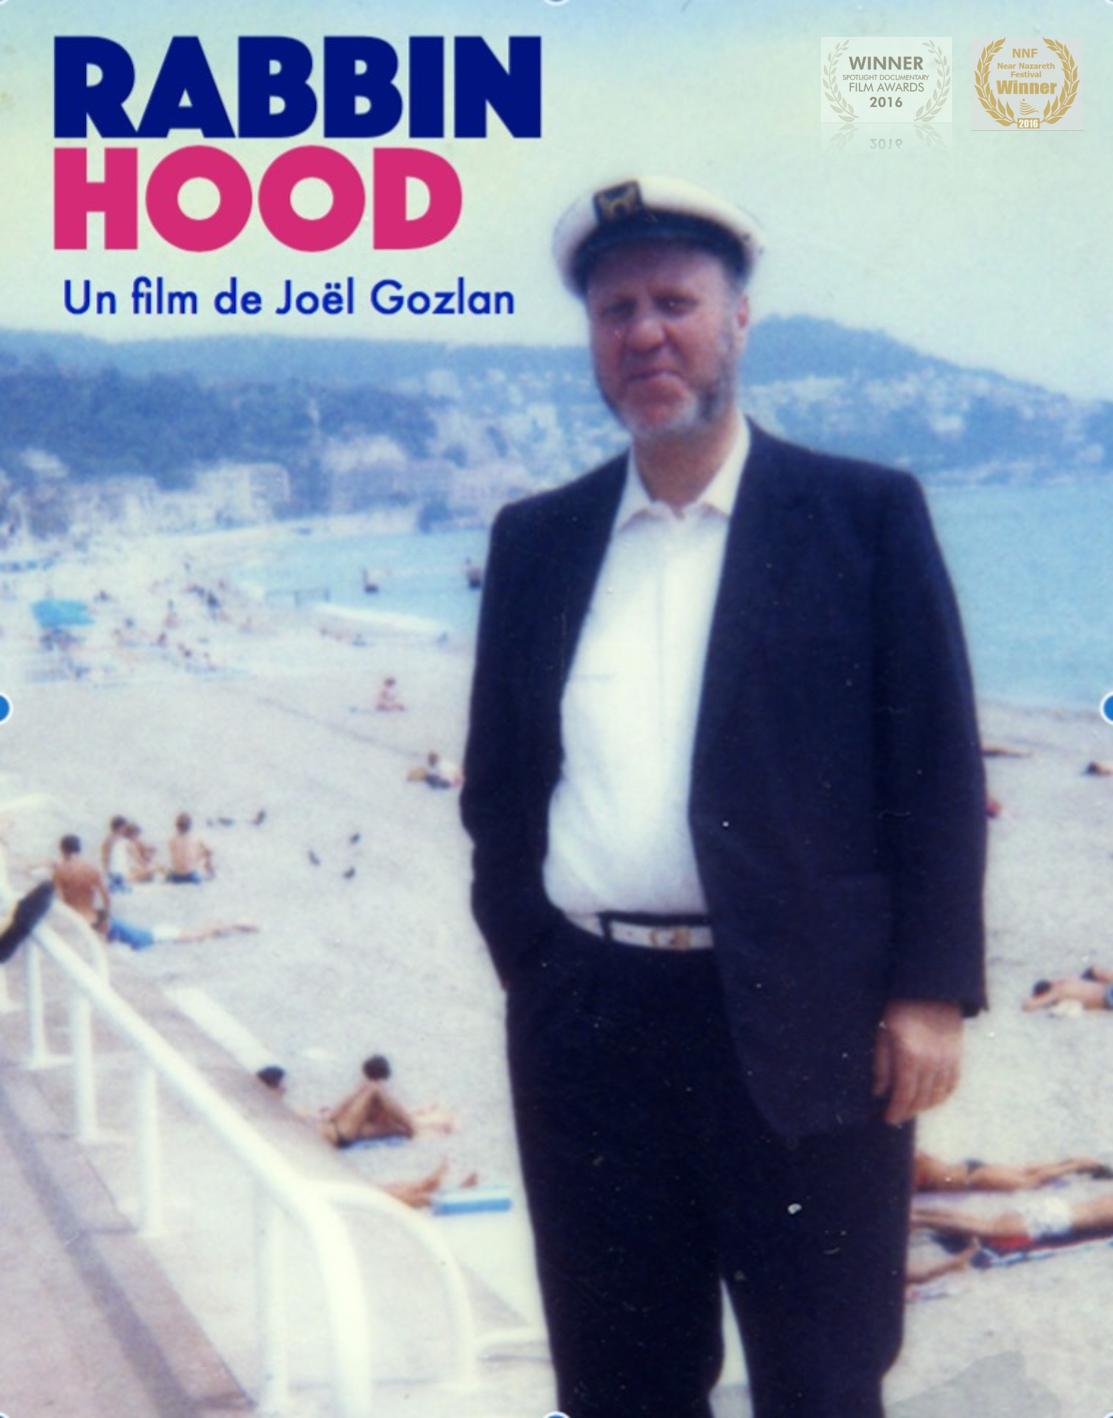 Rabbin Hood, de Joel Gozlan